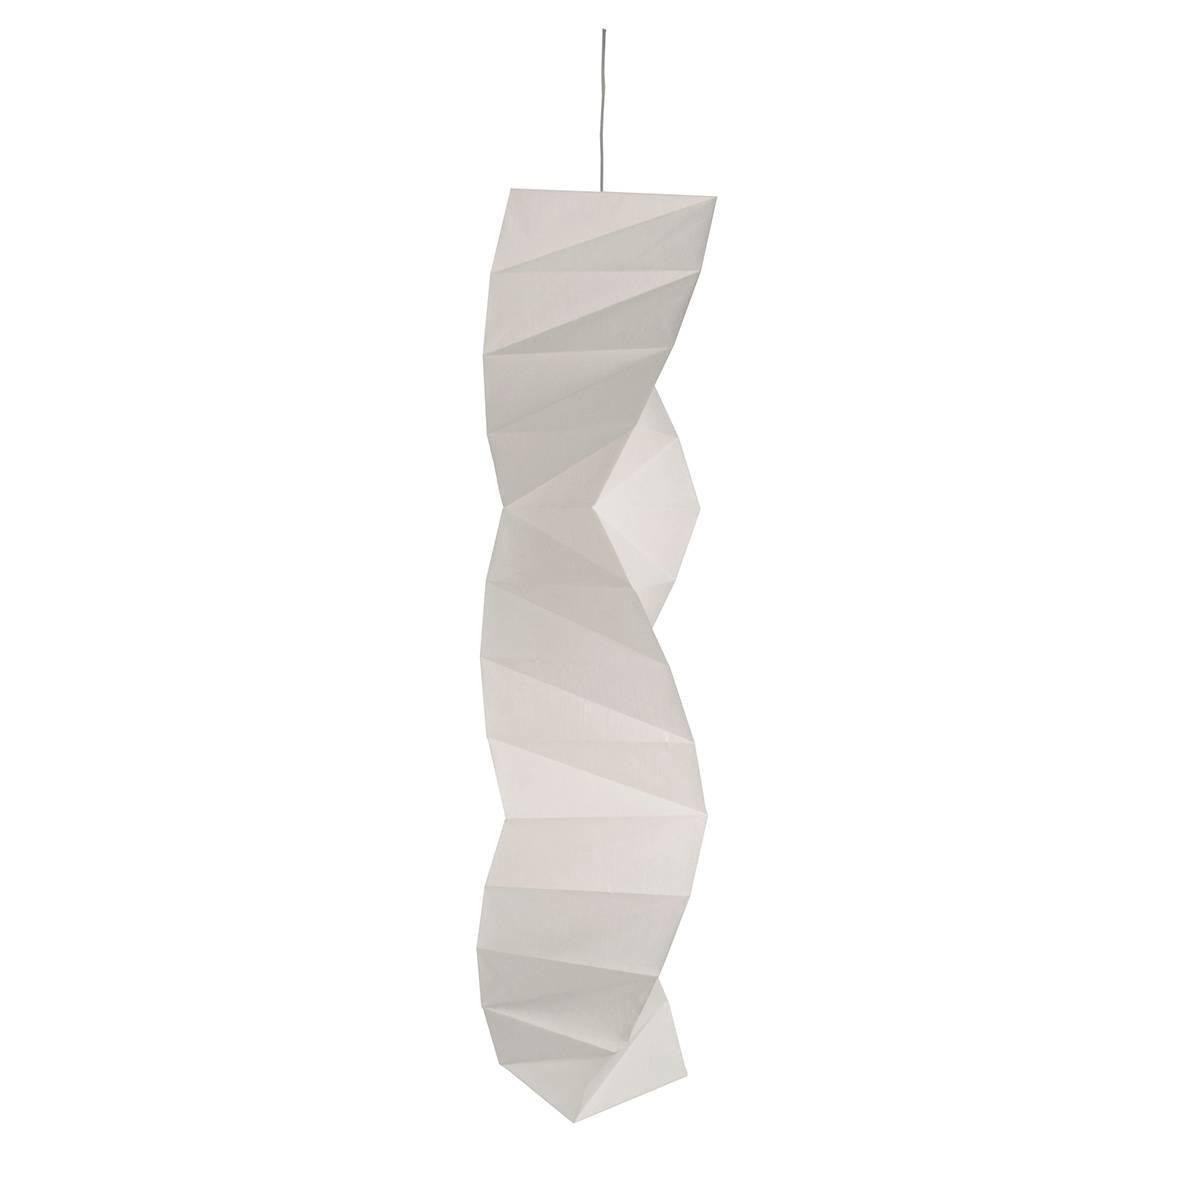 Brand new artemide tatsuno otoshigo suspension lamp by for Artemide issey miyake